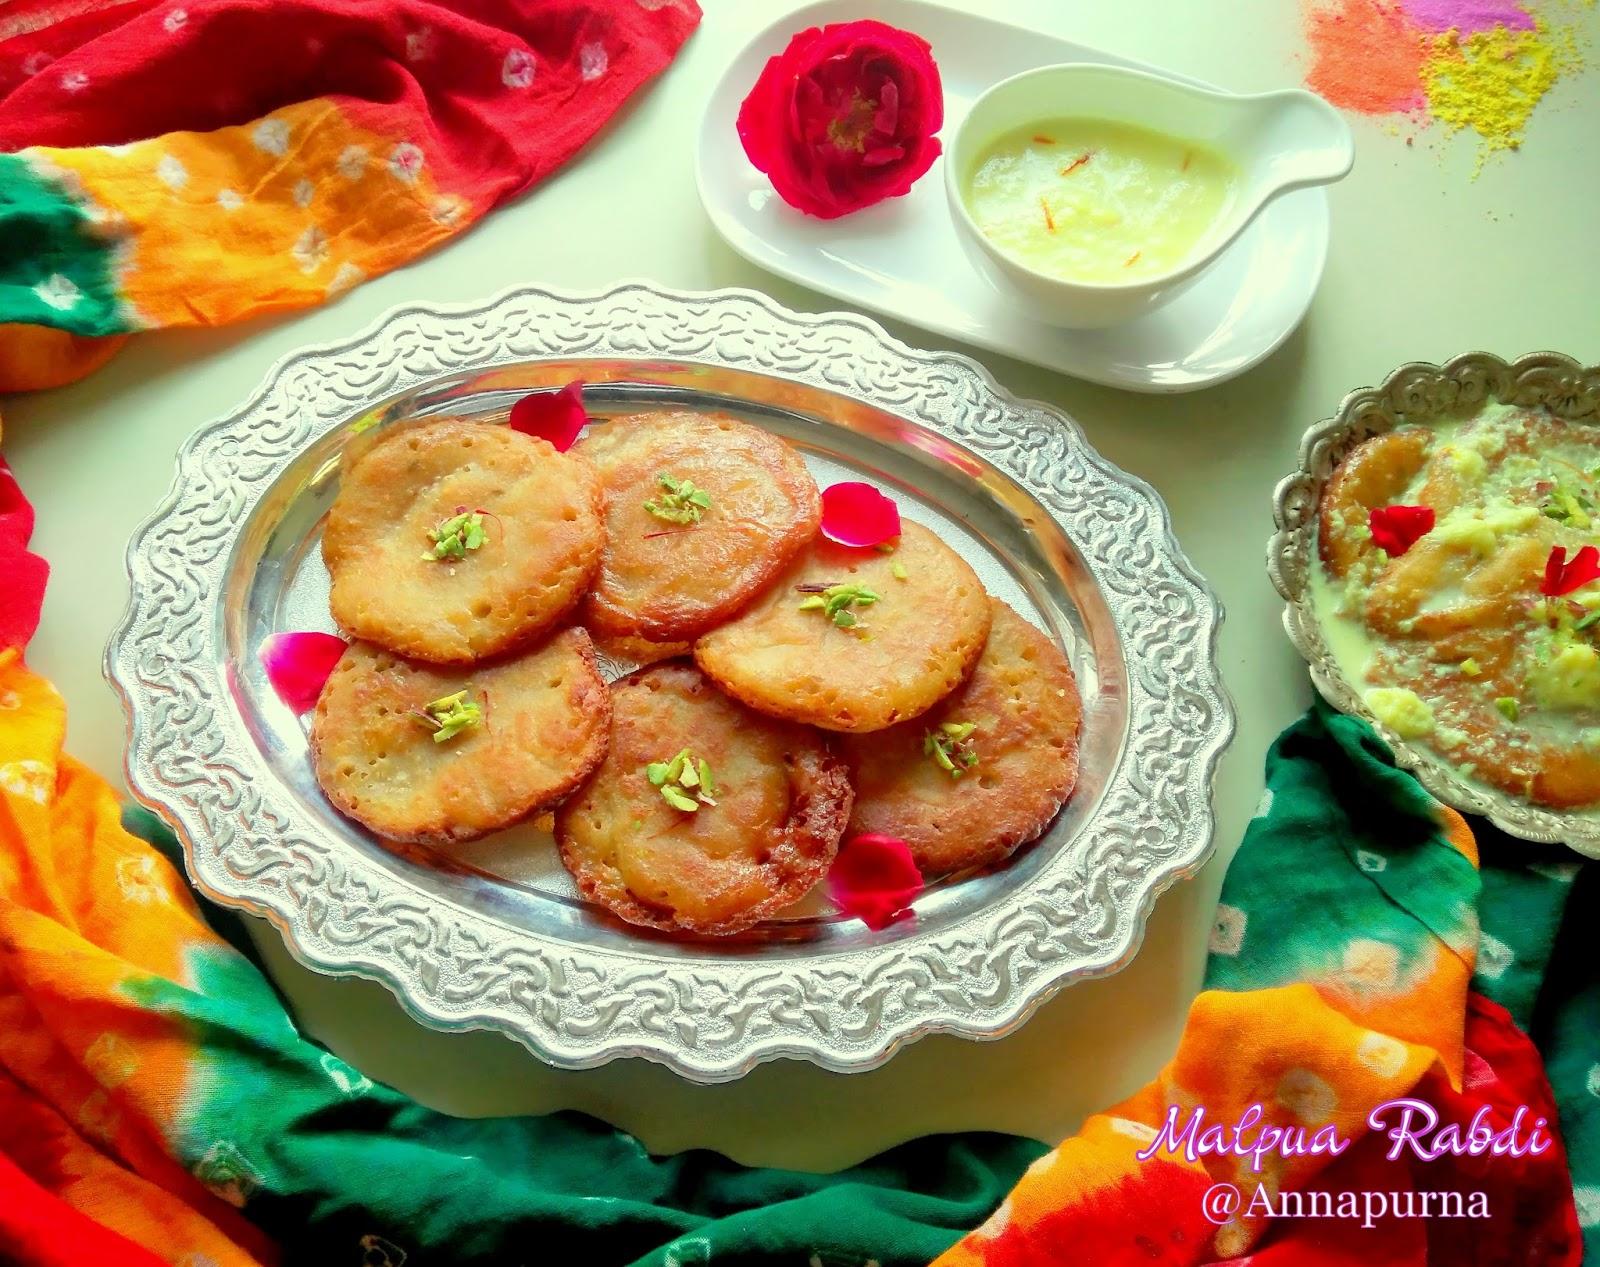 Annapurna malpua indian fried pancake recipe malpua is a traditional dessert popular in indian states of rajasthan uttar pradesh bihar west bengal orissa and maharashtra forumfinder Images